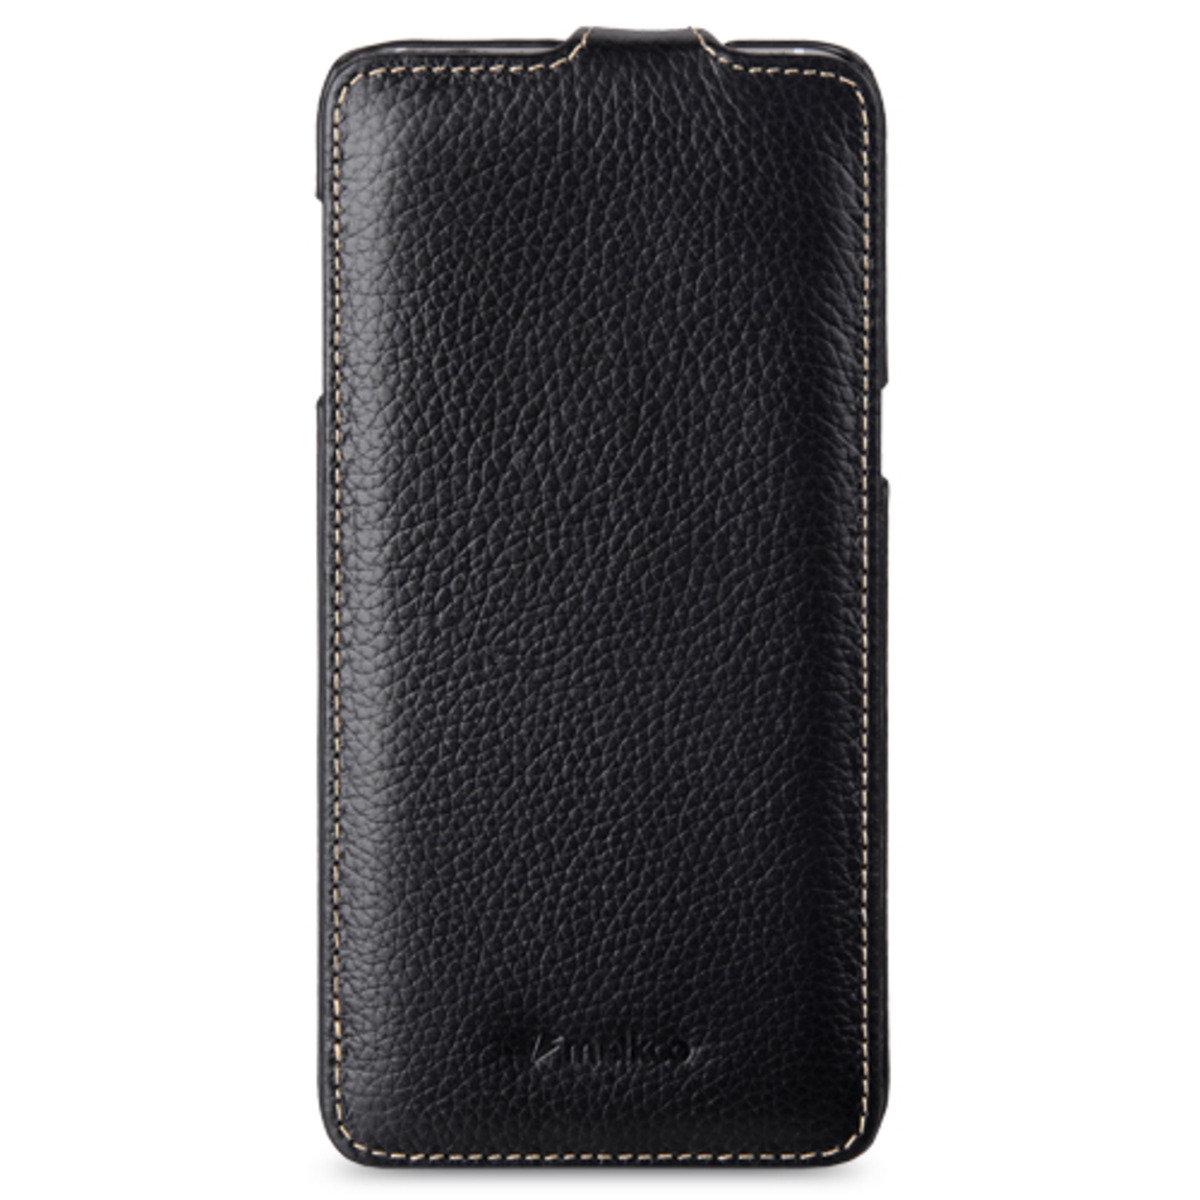 Samsung Galaxy S6 Edge Plus Jacka Type 高級真皮革手機套 - 黑色荔枝紋